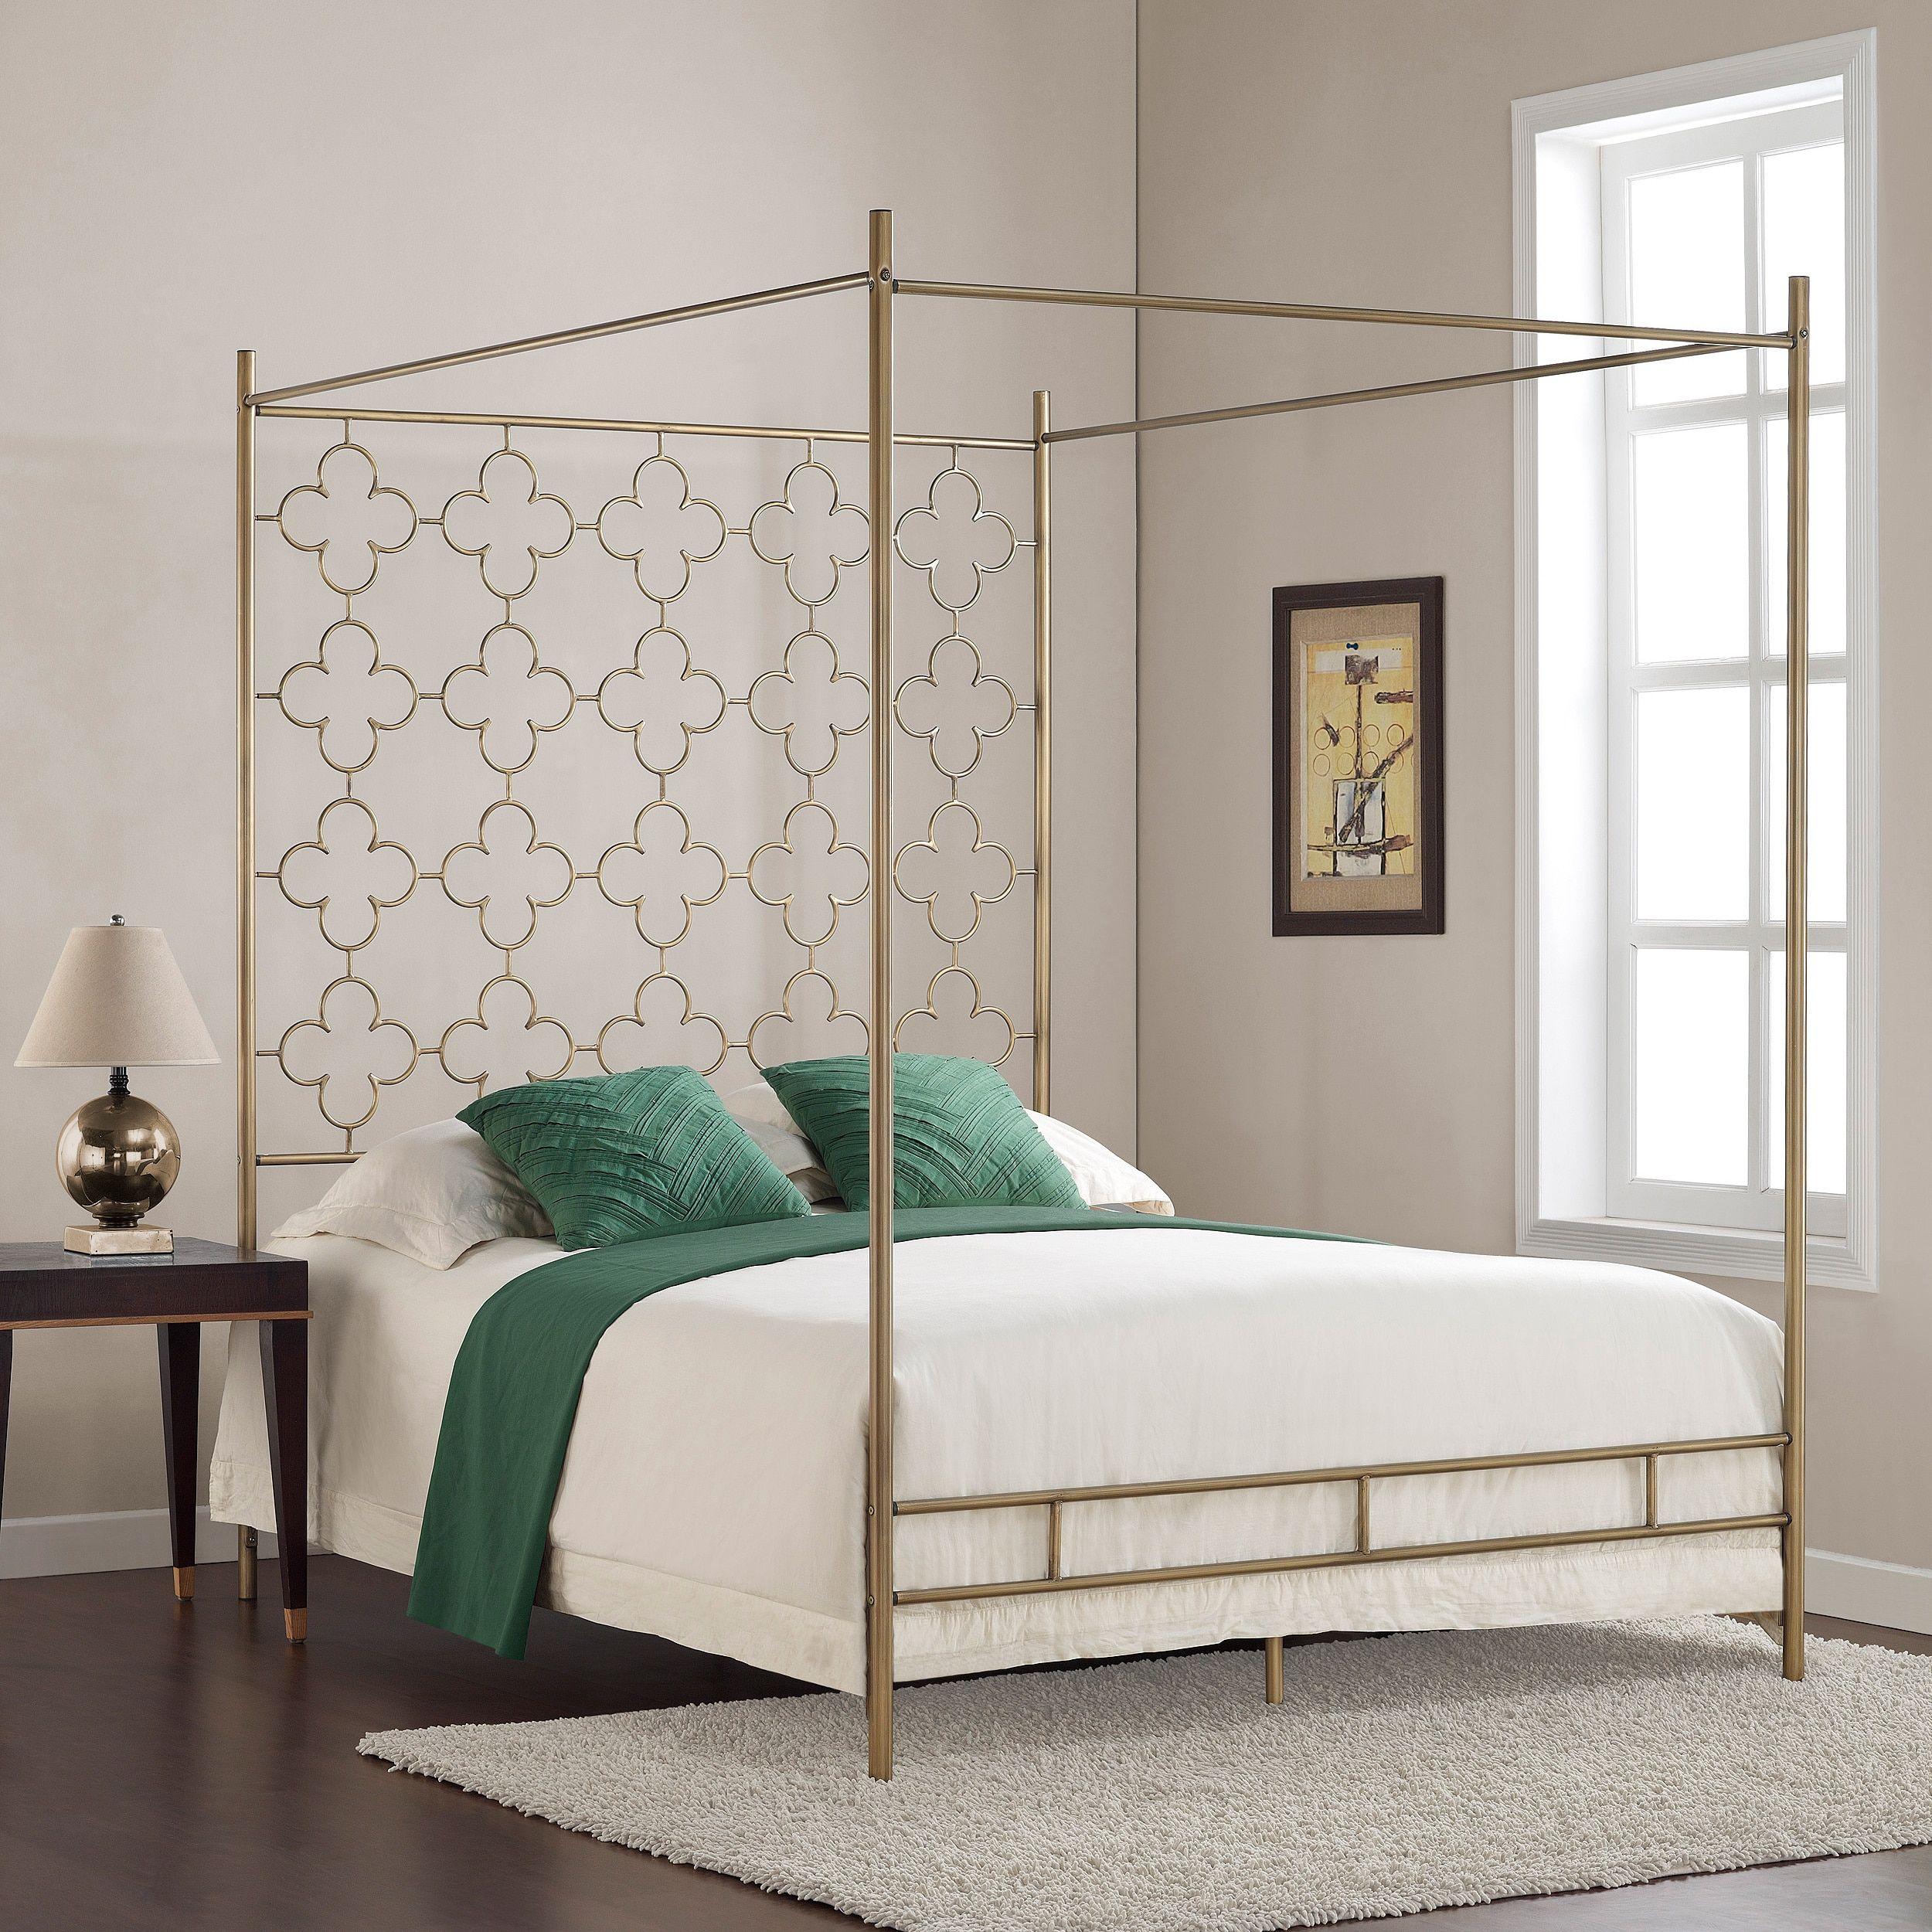 Retro Glitz Quatrefoil Queen Canopy Bed | Overstock.com Shopping - The Best Deals on Beds